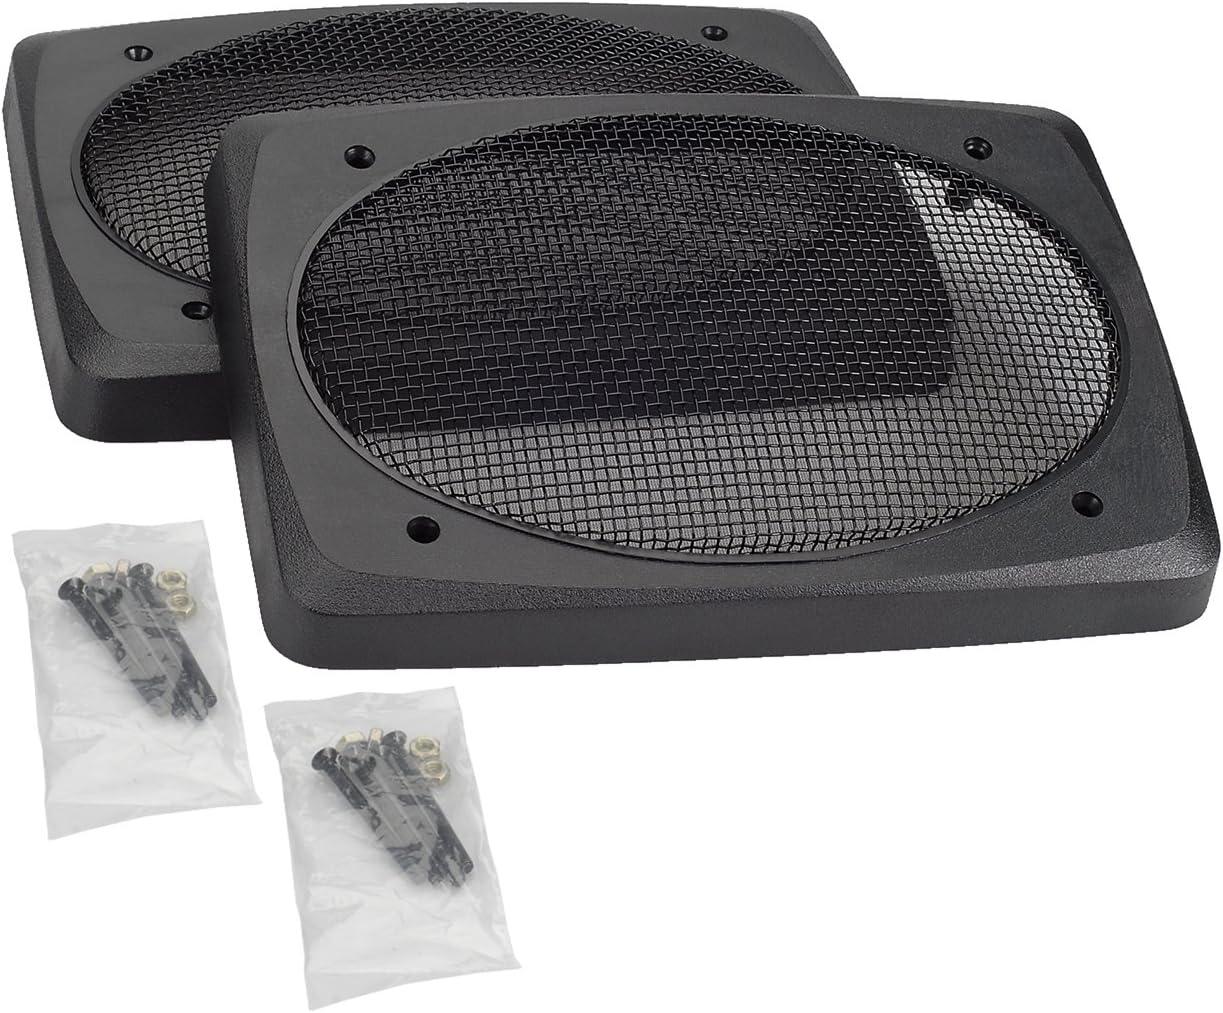 "Magnadyne G8D-Pair 8""x8"" Speaker Grill - Black Wire Mesh"